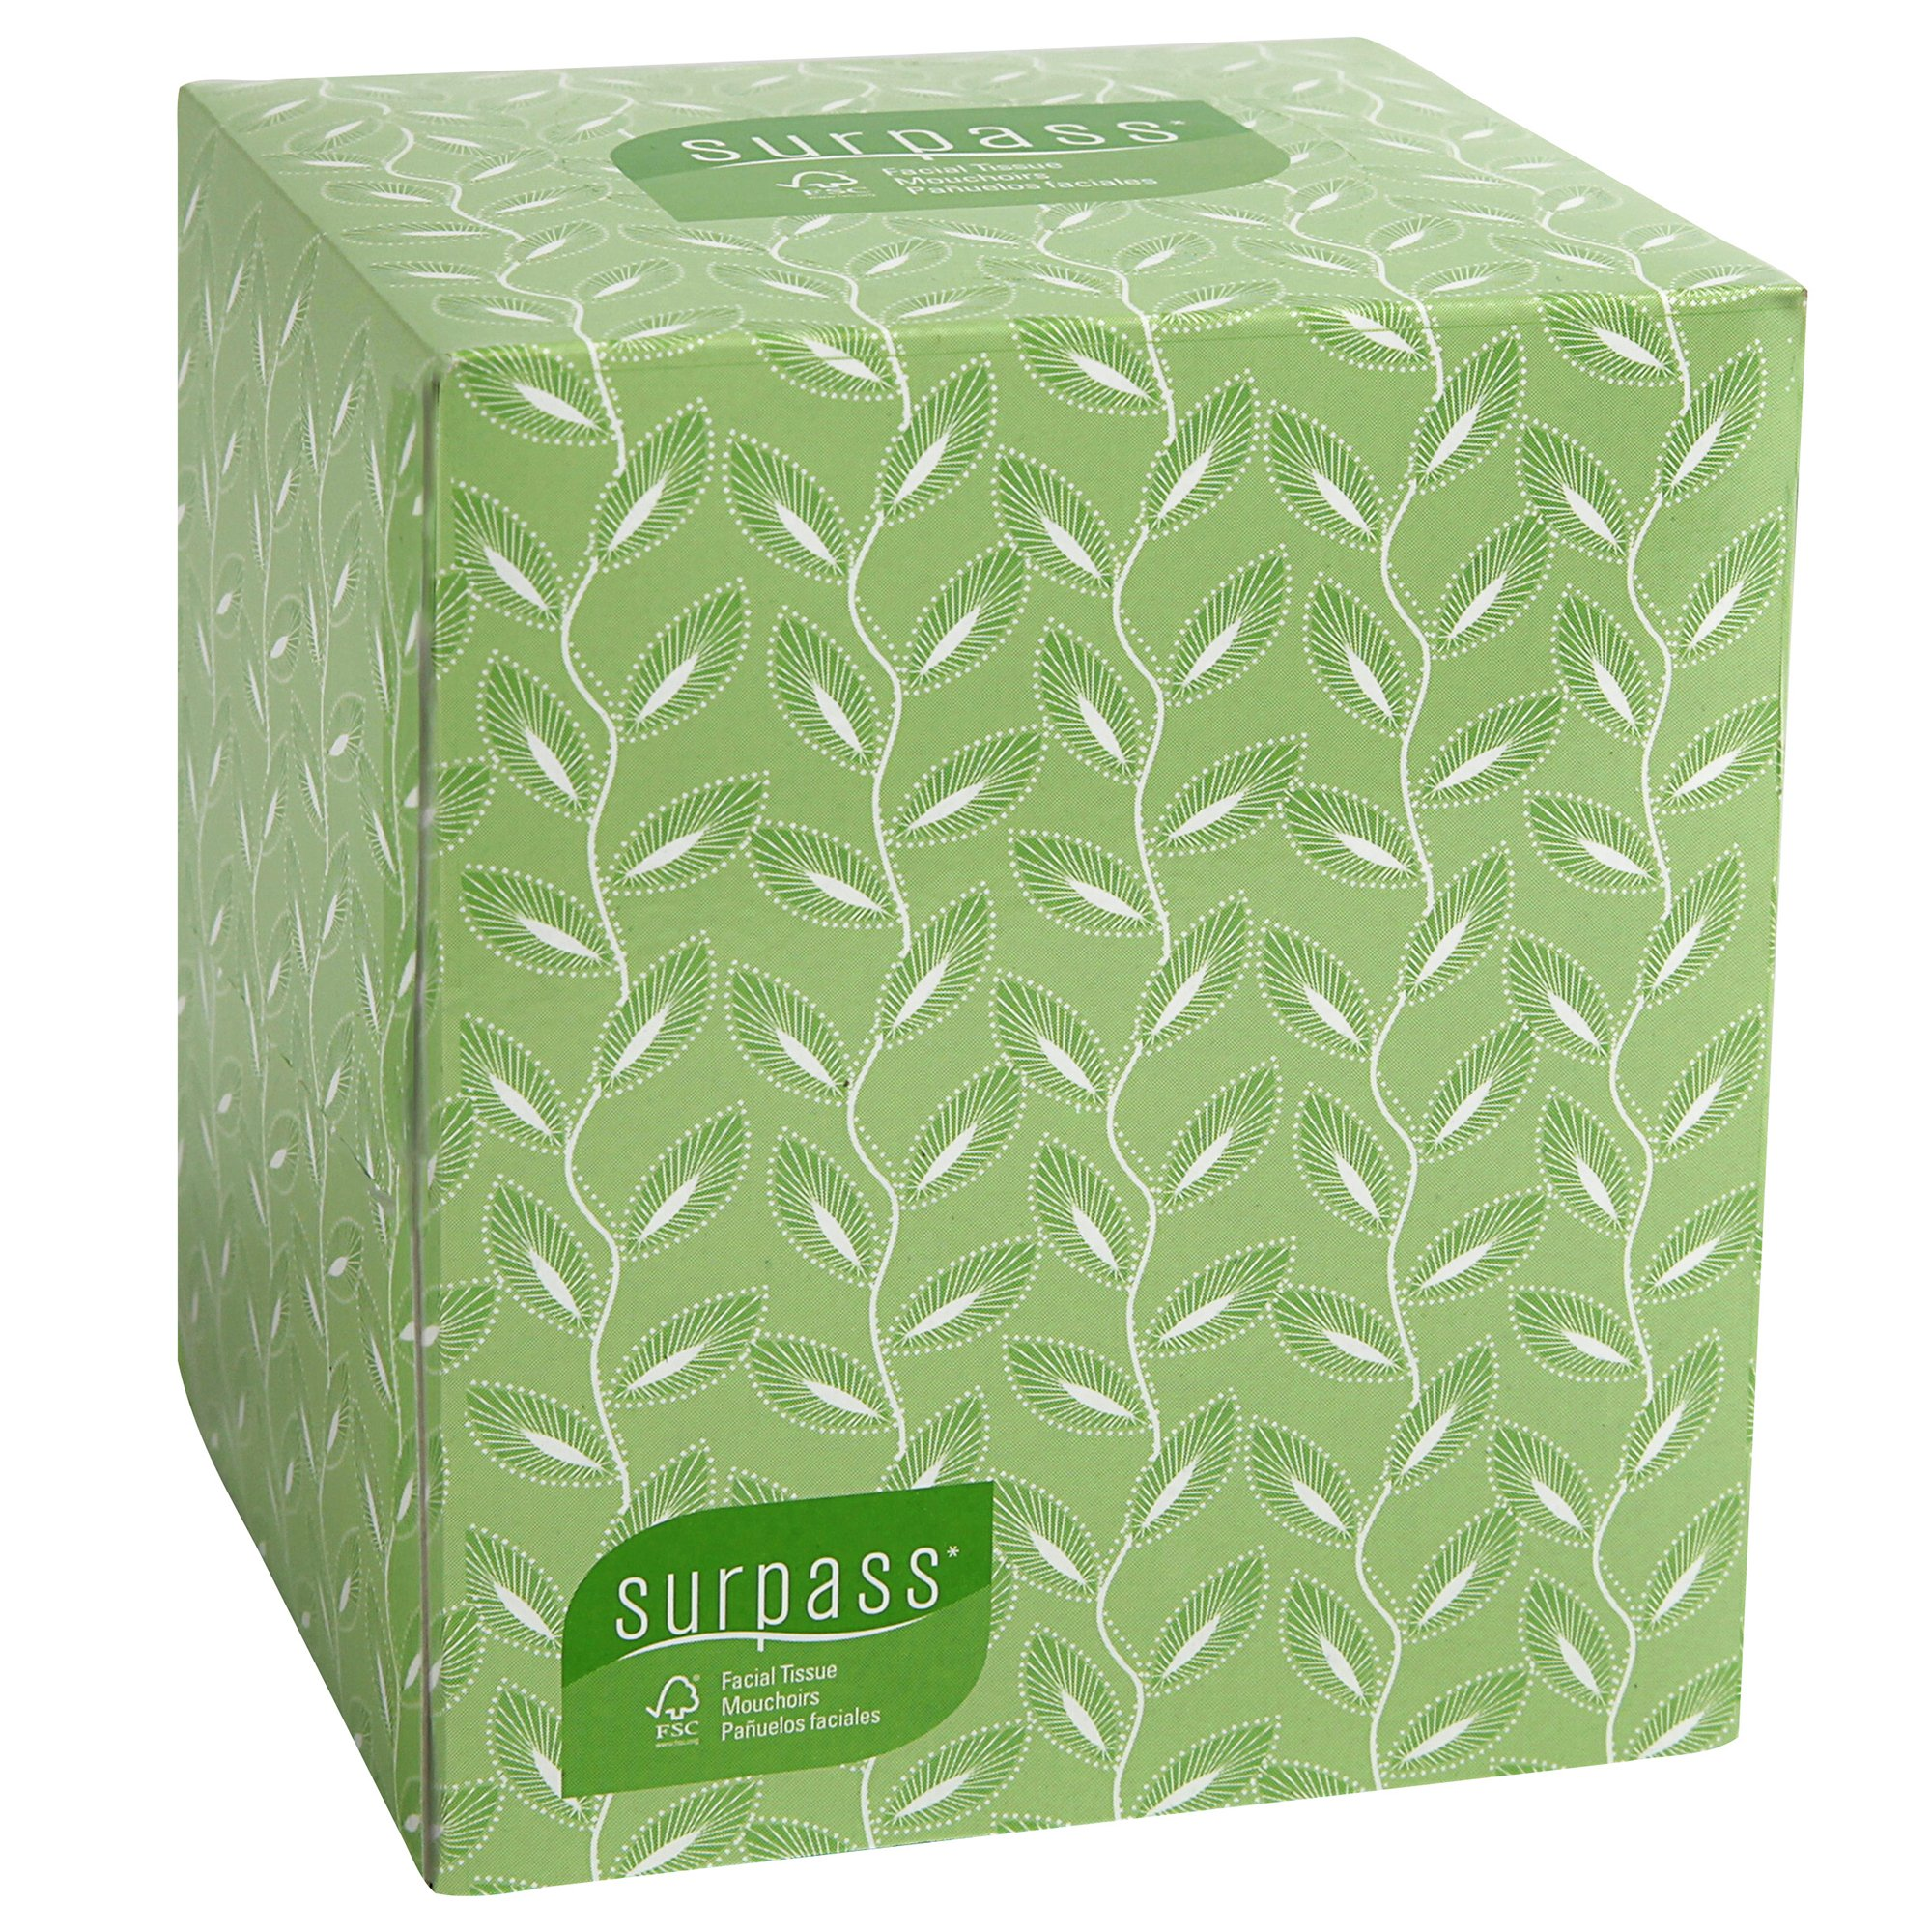 Surpass Boutique Facial Tissue Cube (21320), 2-Ply, White, Unscented, 110 Face Tissue/Box, 36 Boxes/Case